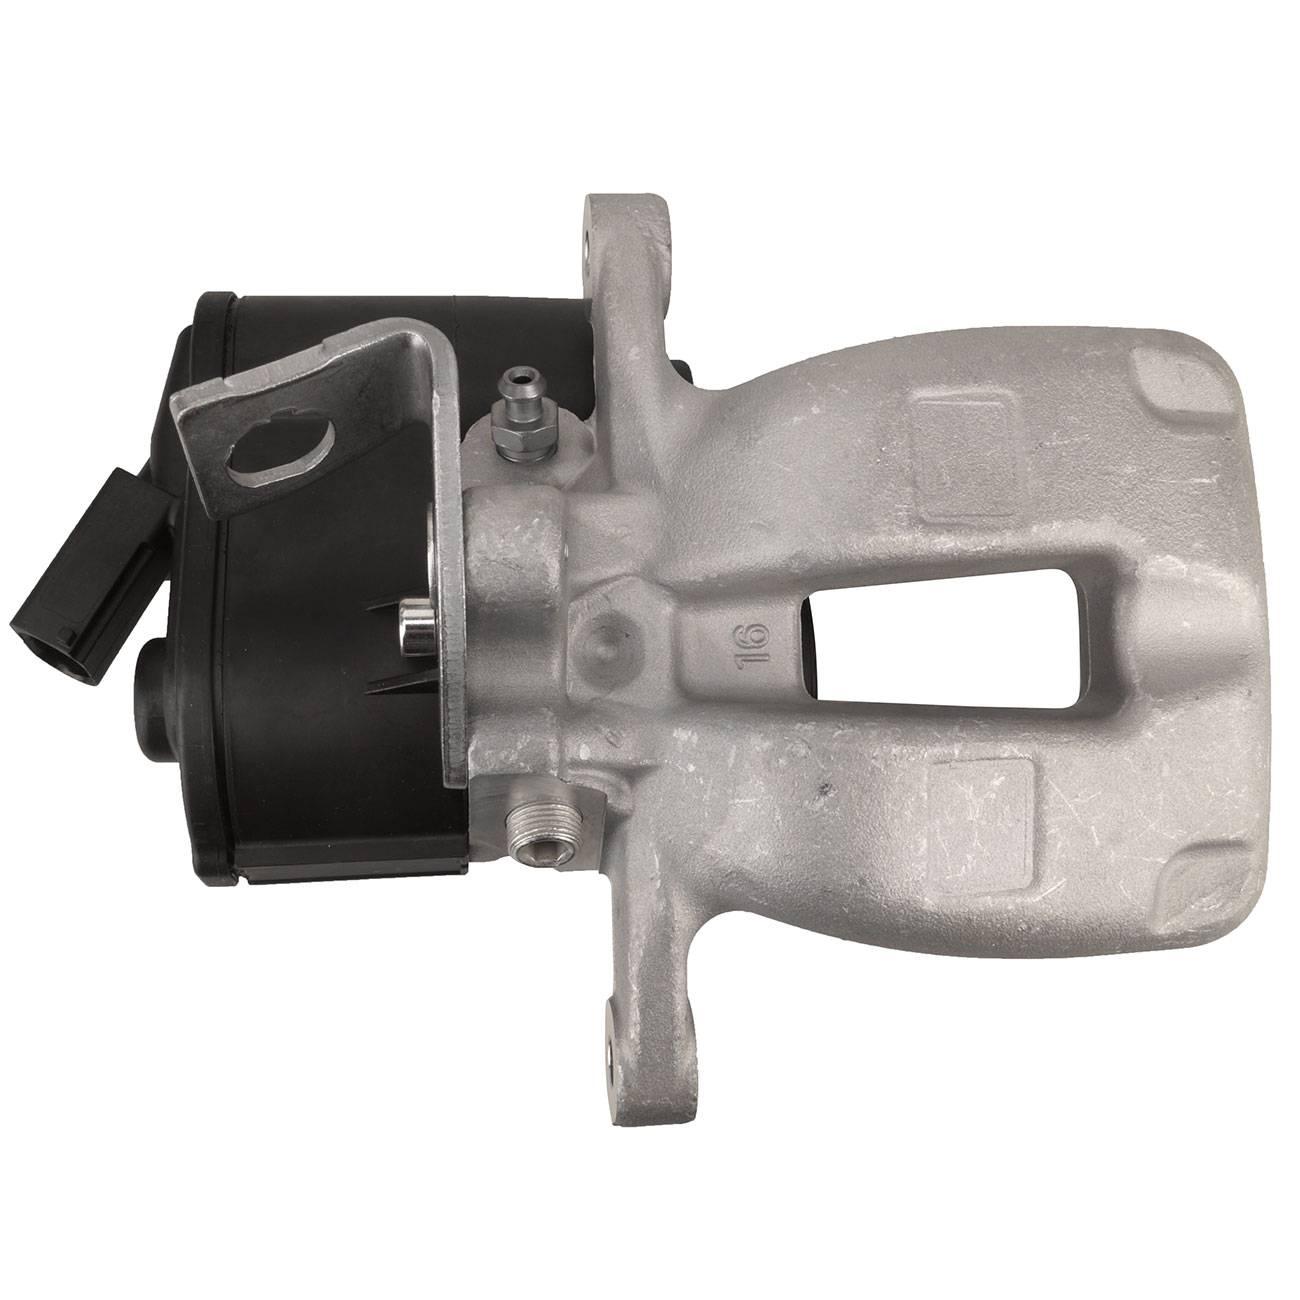 Bapmic-Rear-Left-Brake-Caliper-Brake-System-for-BMW-220i-228i-235i-320i-328i